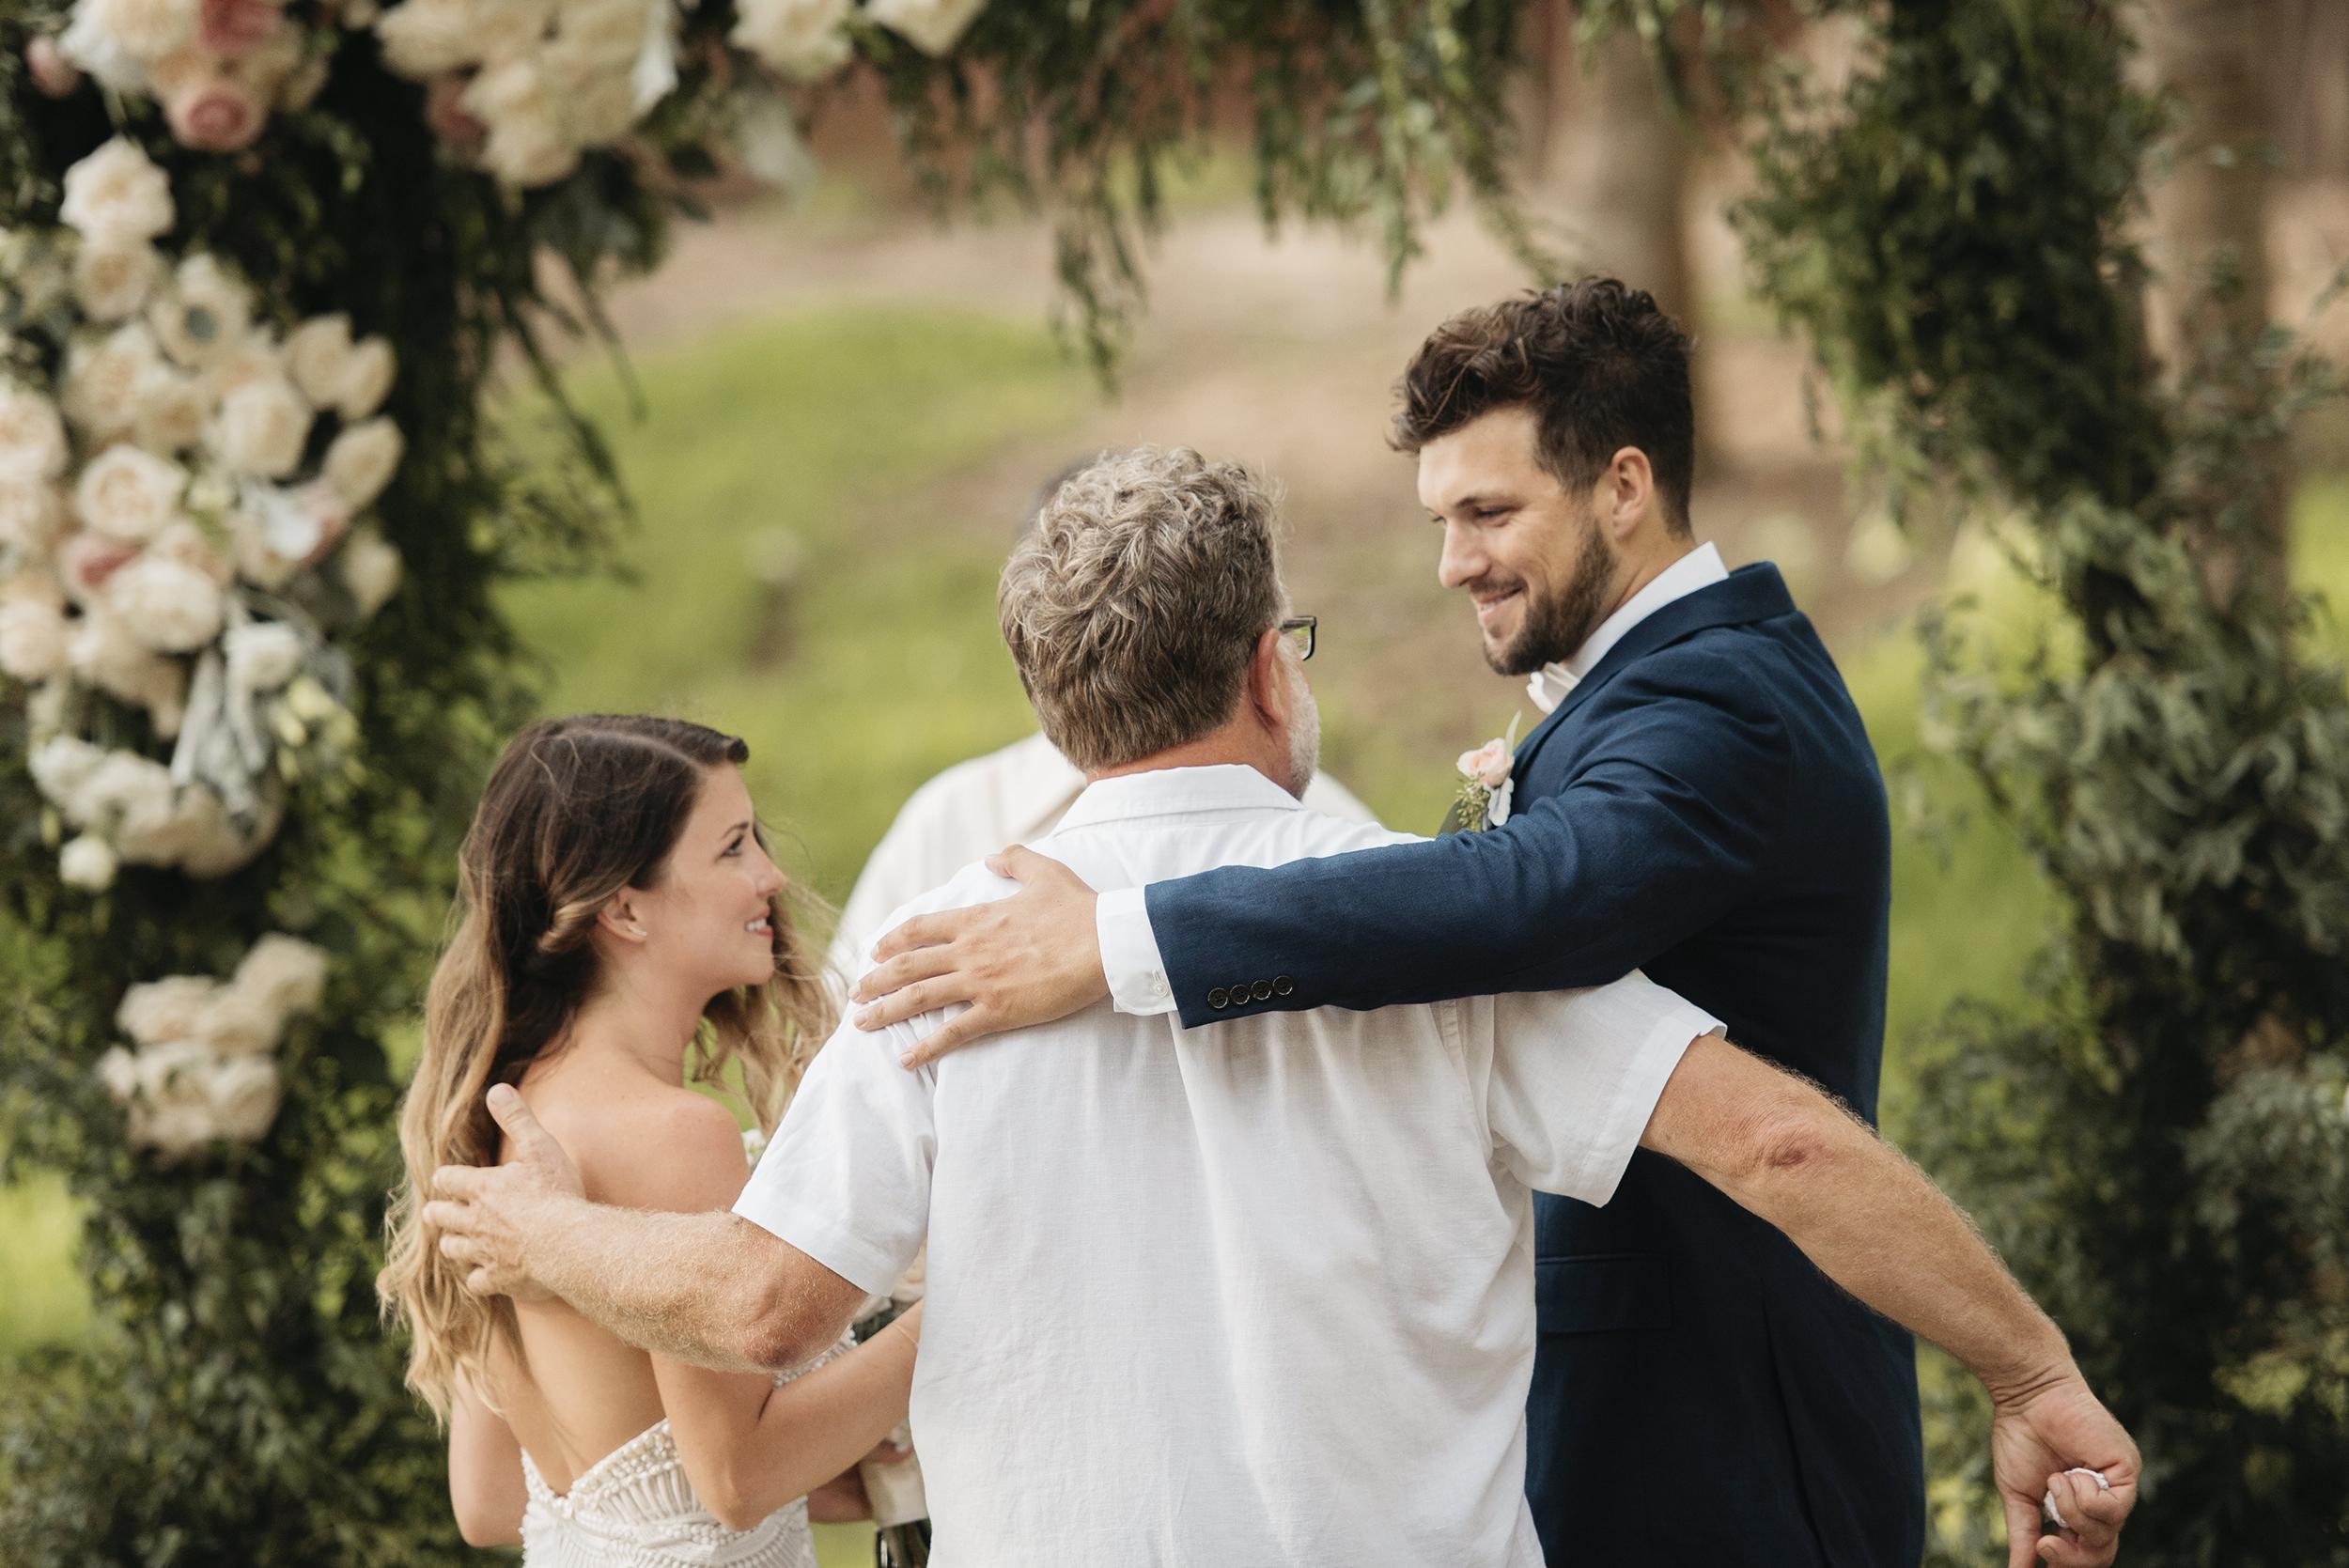 Colby-and-Jess-Intimate-Destination-Wedding-Sayulita-Puerto-Vallarta-Mexico402.jpg